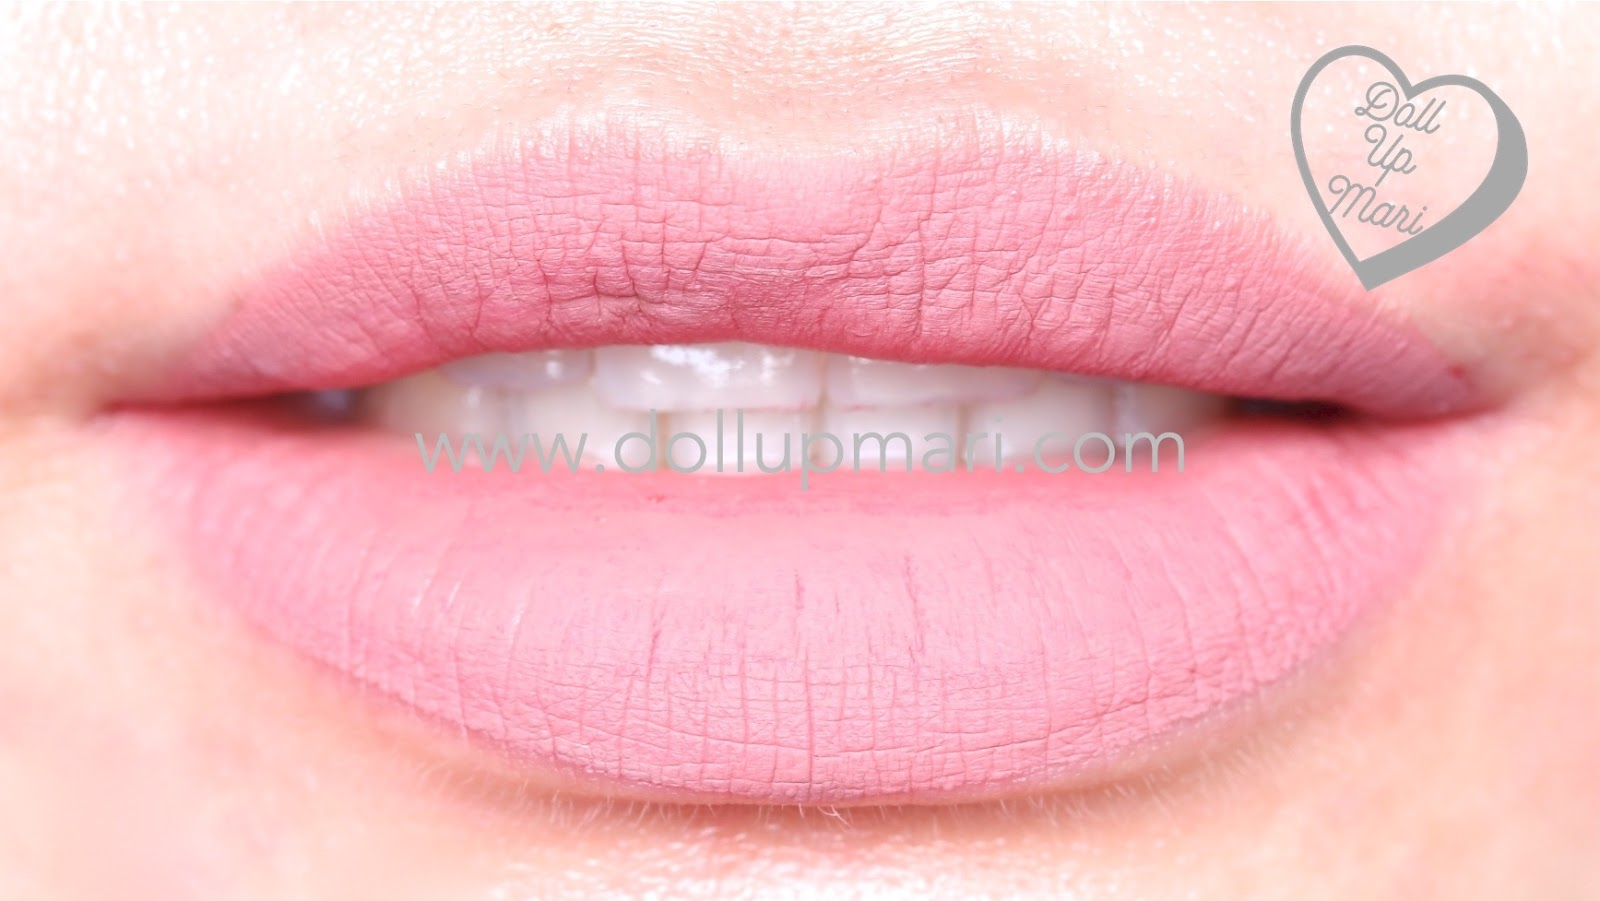 lip swatch of SilkyGirl Matte Junkie Lipcolor (10 Cupid)